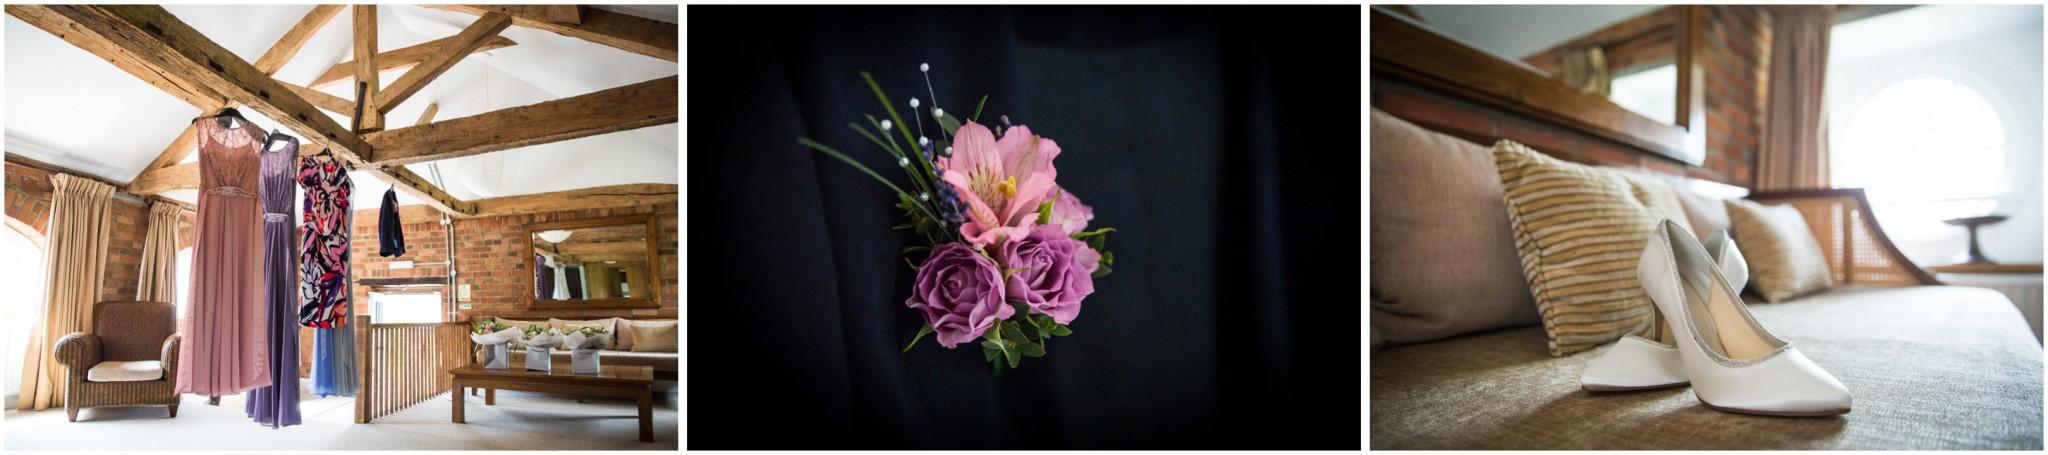 Wasing Park Wedding Photography Detail shots